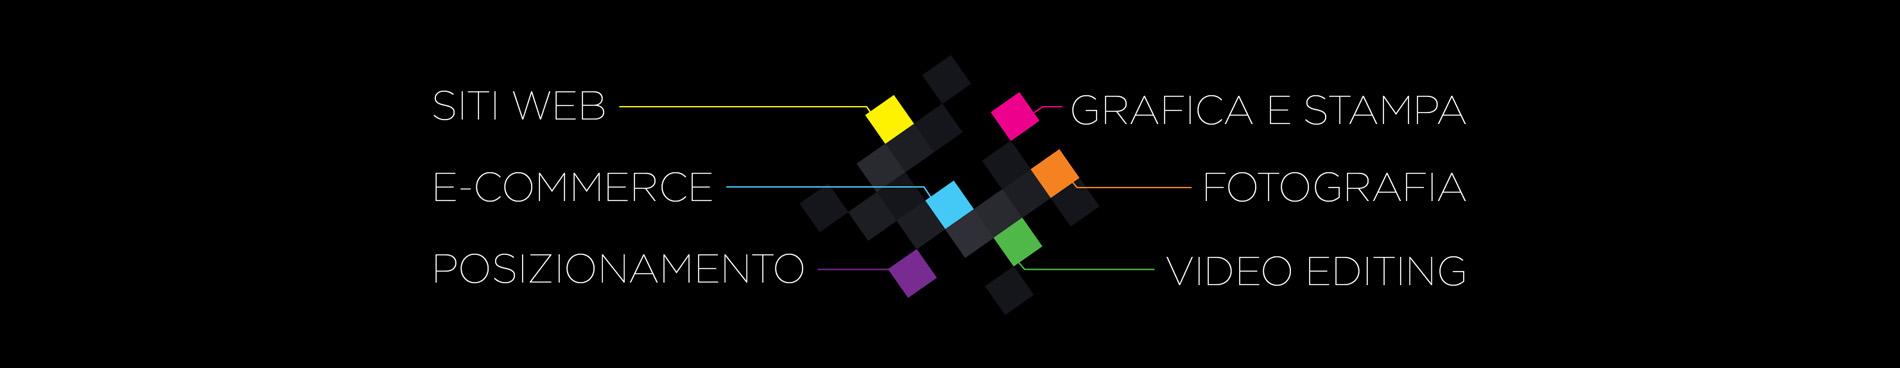 siti-web-venezia-logo